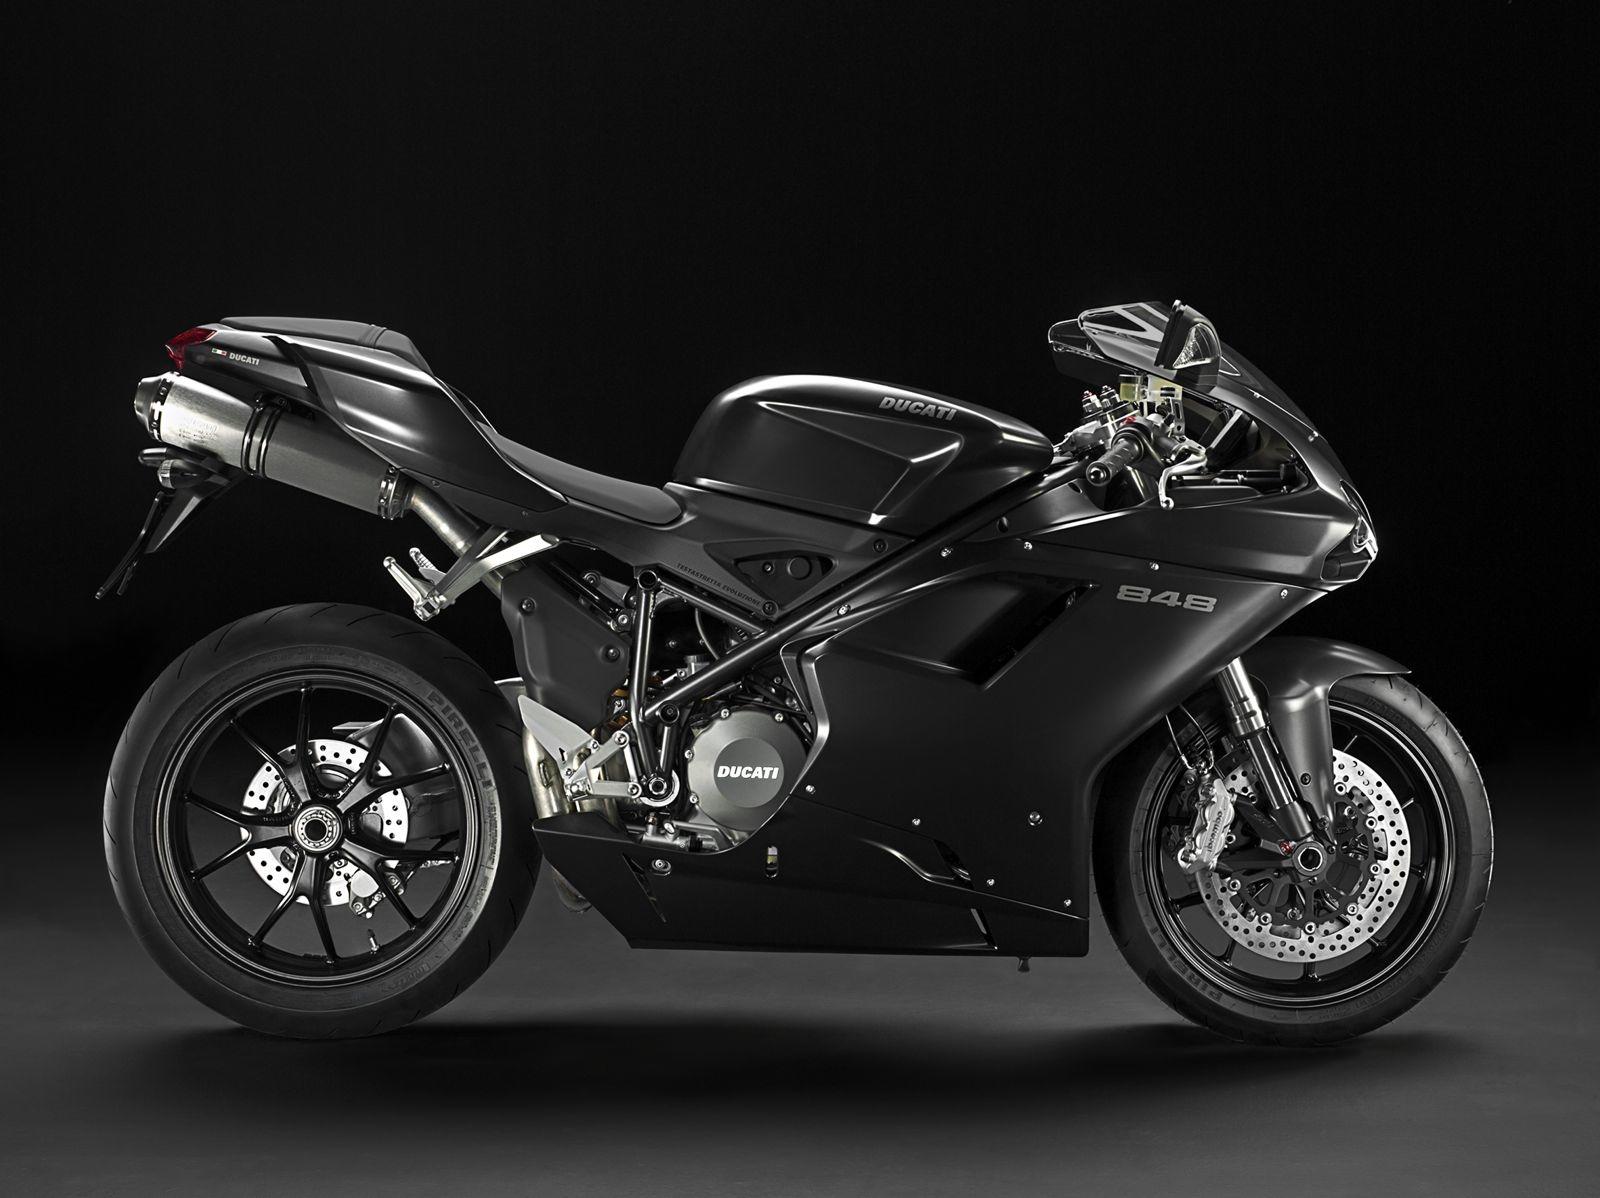 Sandeep Name Wallpaper 3d Ducati Superbike 1198 R Corse